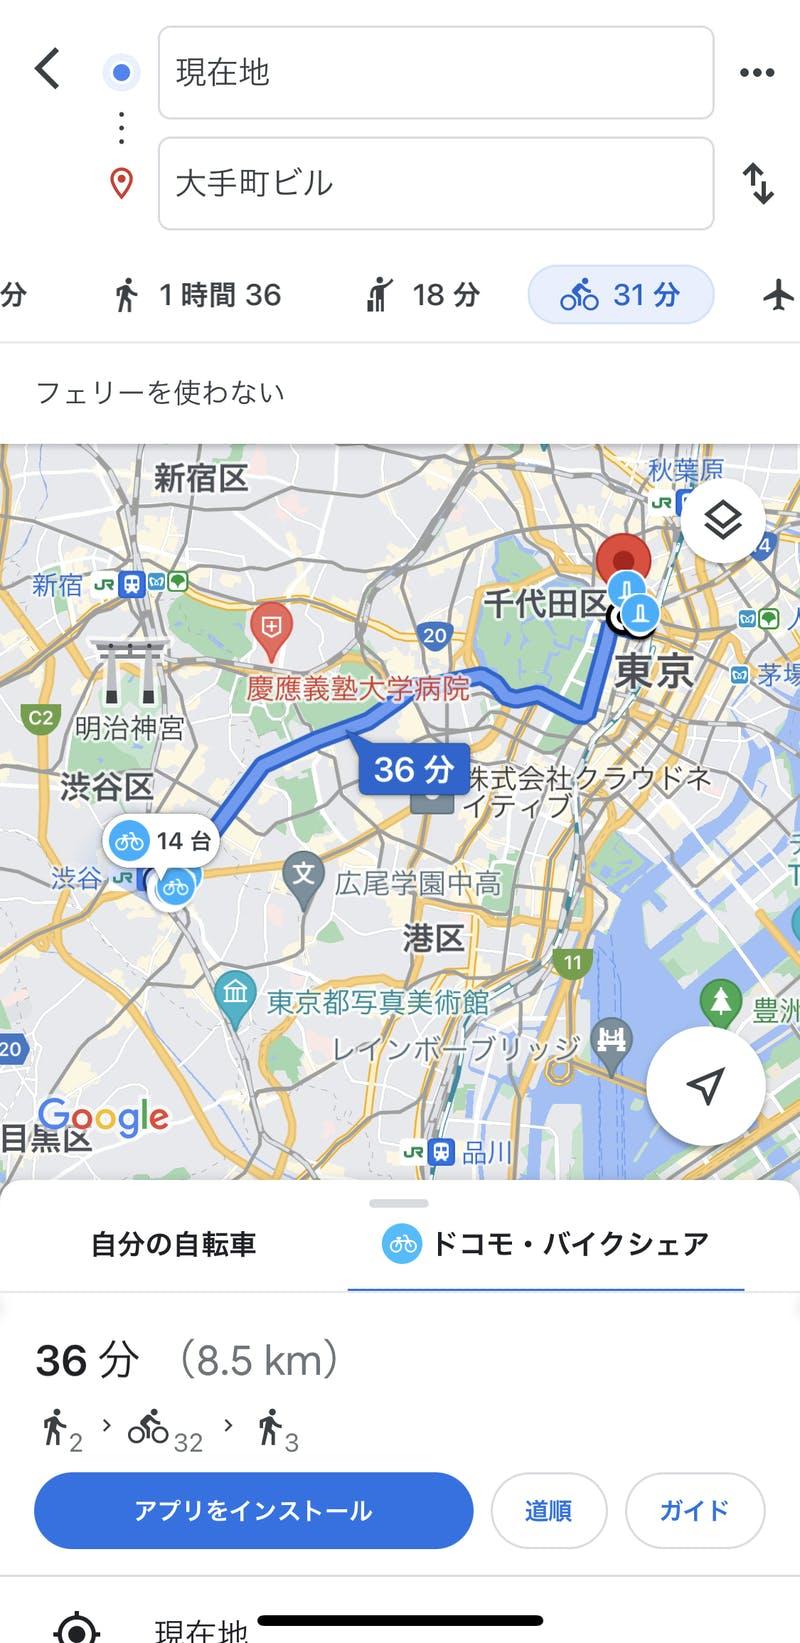 Googleマップの経路検索で「ドコモ・バイクシェア」を選択